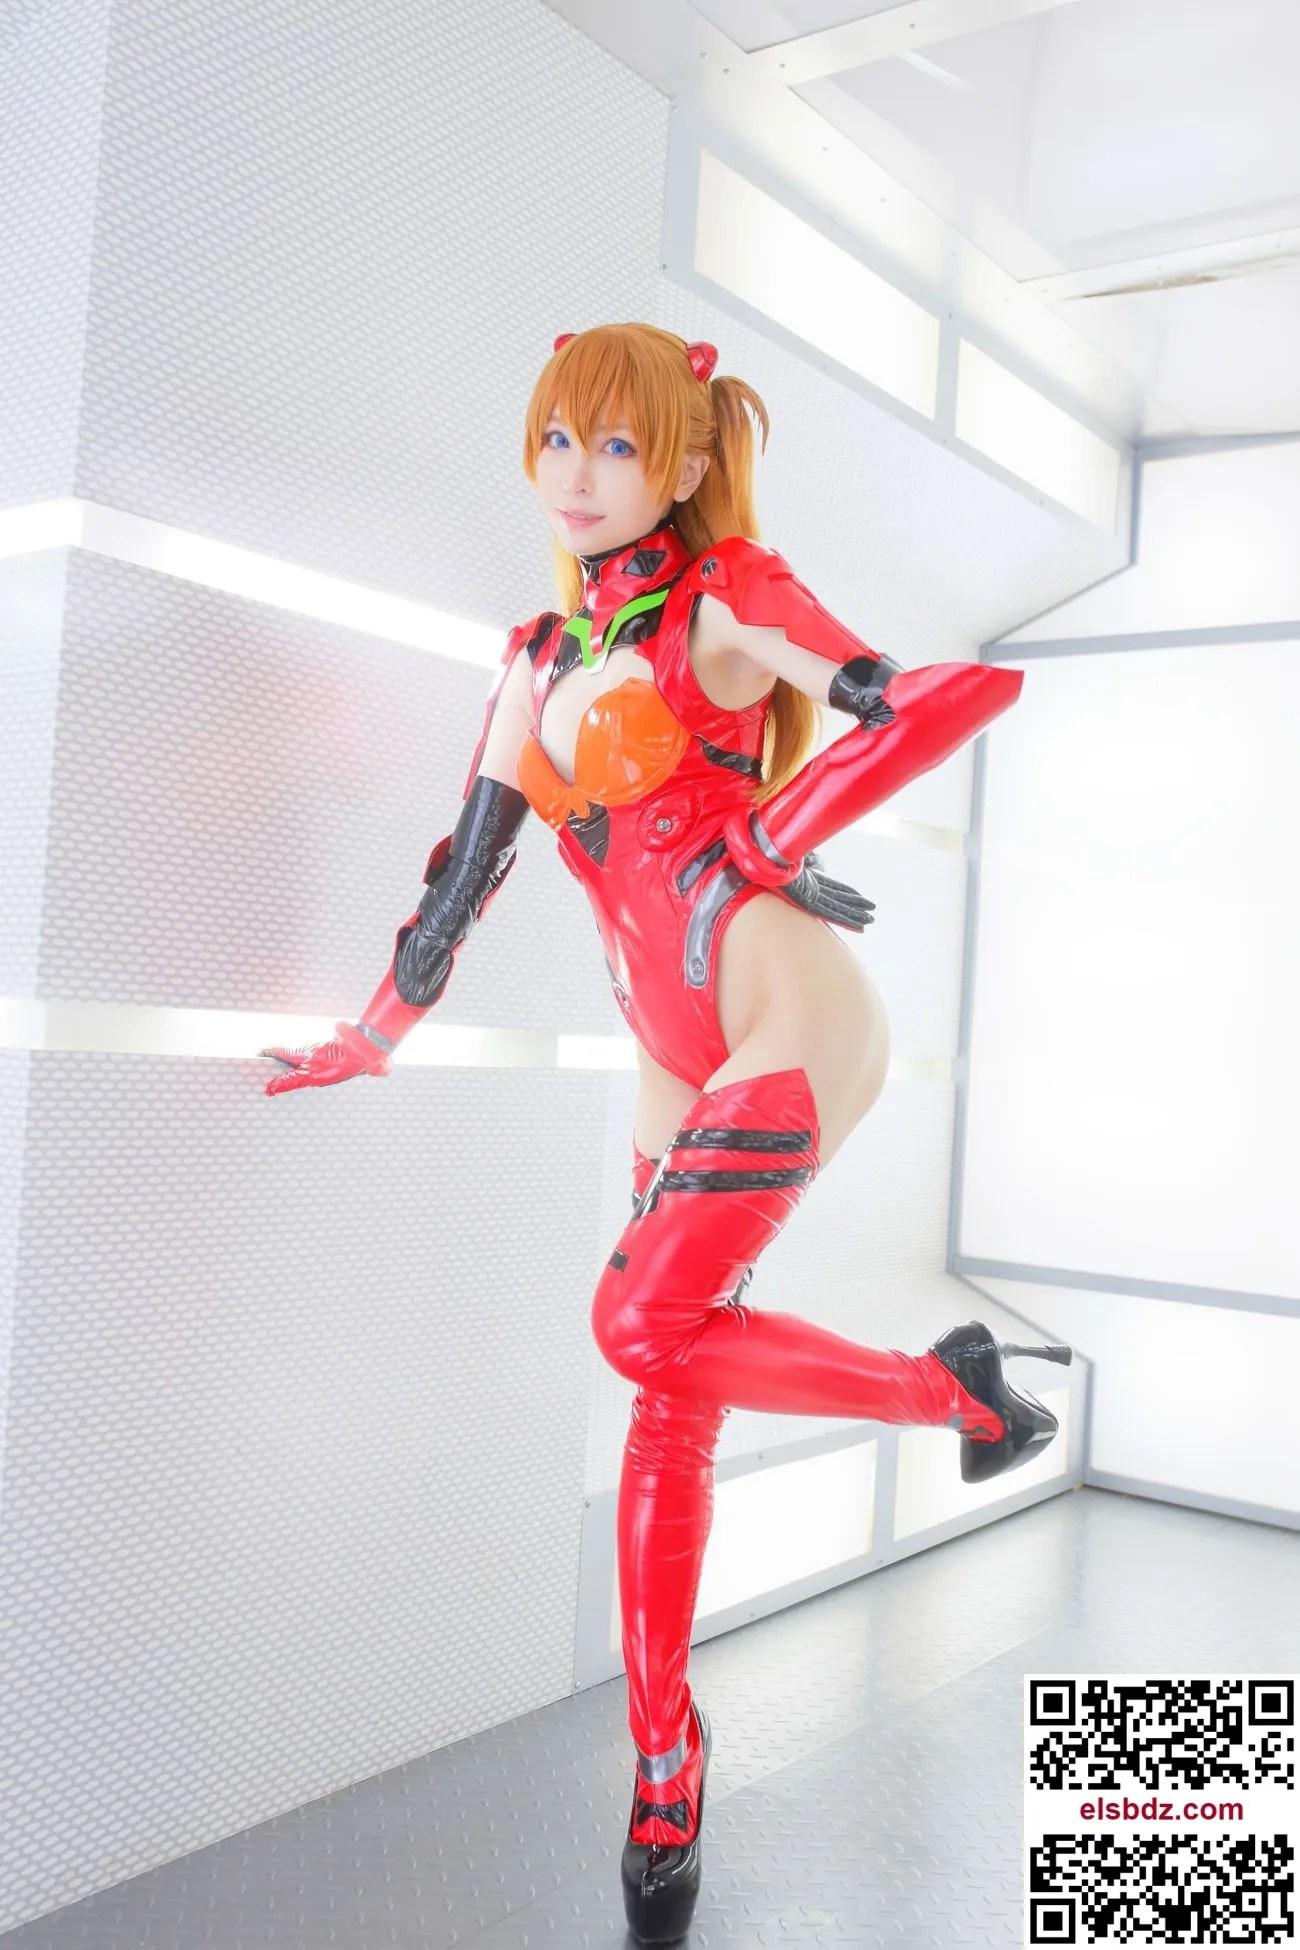 Cosplay みやこどんぶり みやこりお Asuka 2nd插图(1)